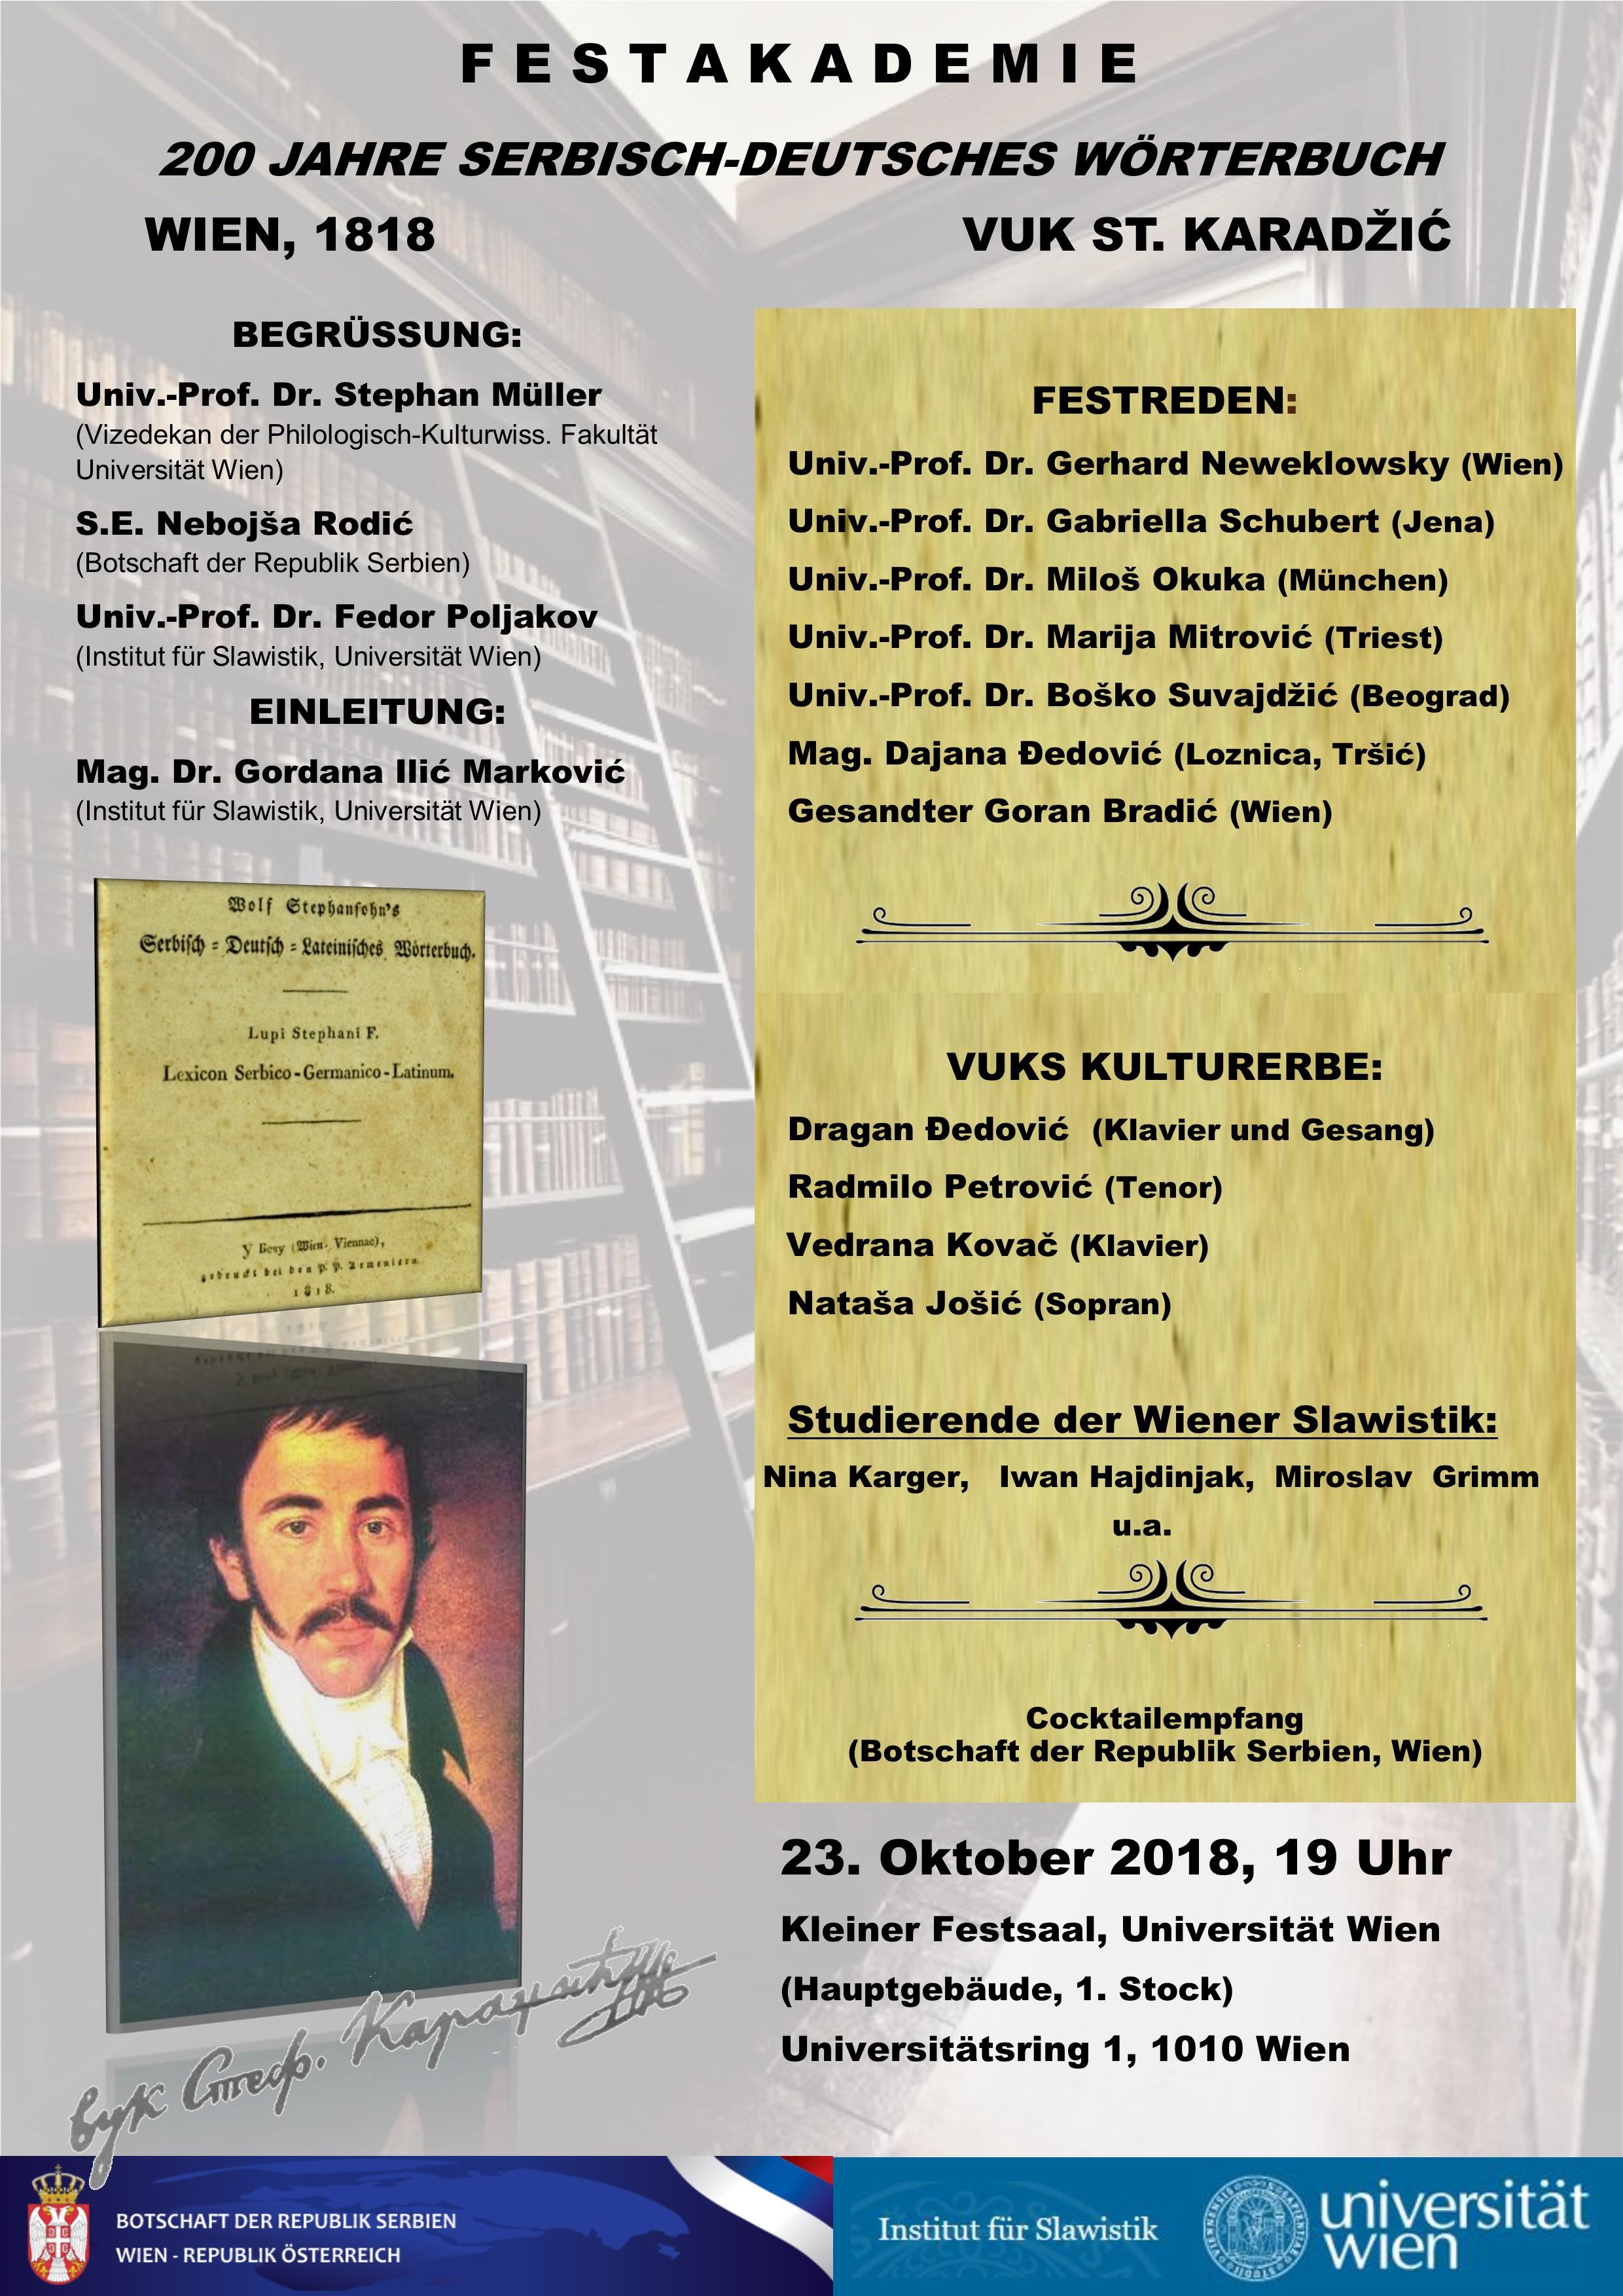 Botschaft Der Republik Serbien Wien Republik österreich